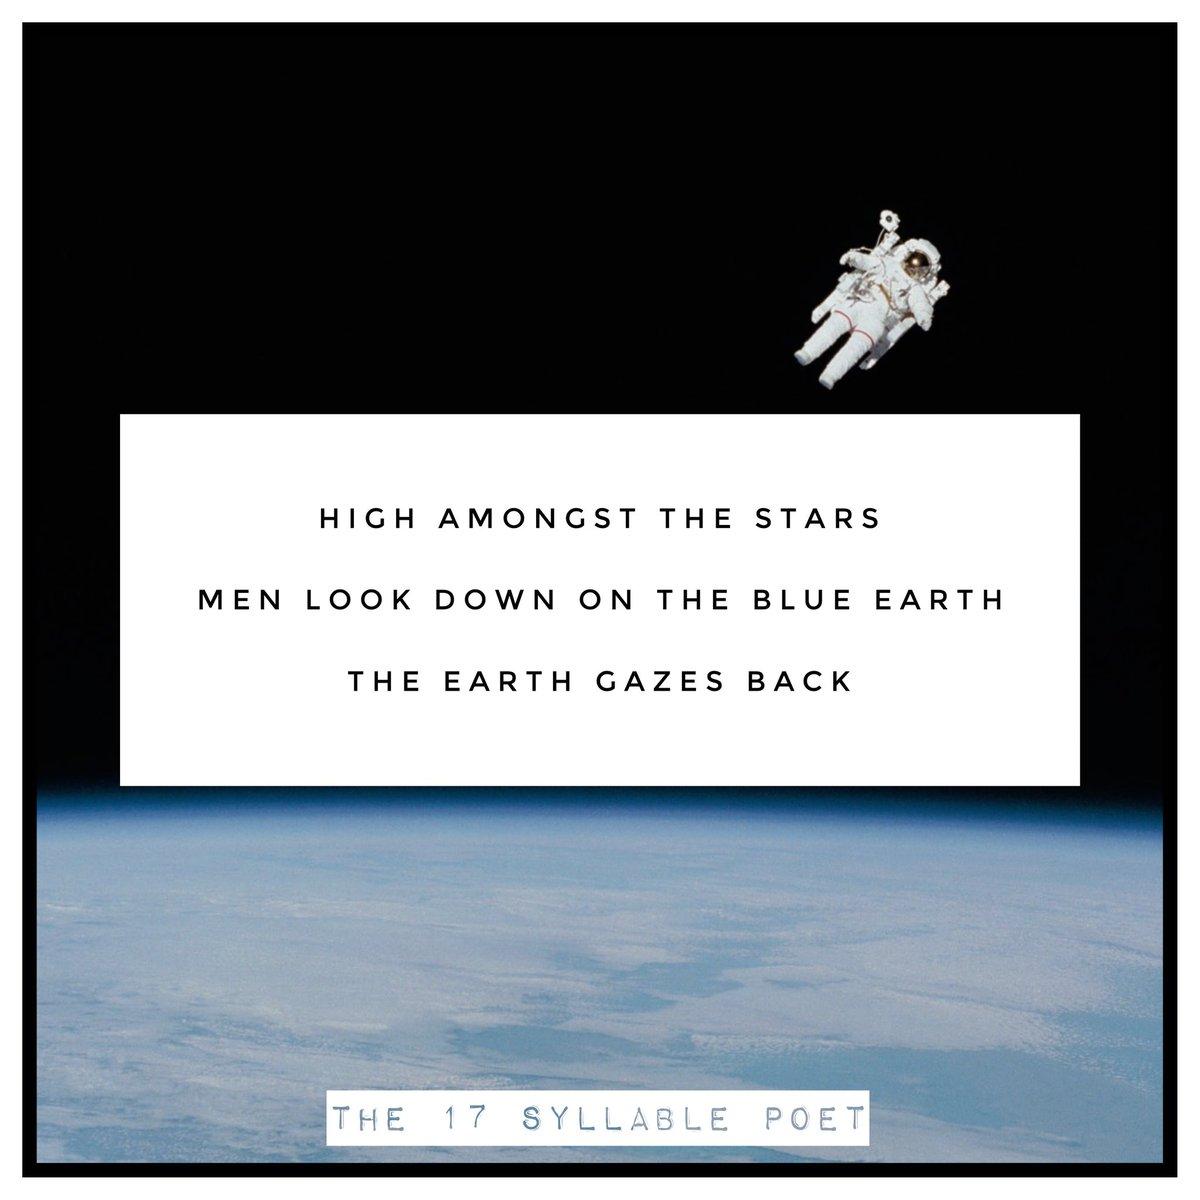 Haiku #153 * Daily Haikus by The 17 Syllable Poet * #the17syllablepoet #SpaceX #space #haiku #haikupoem #haikusoftwitter #haikuaday #dailyhaiku #dailypoems #poetry #poems #poem #17syllables #writersoftwitter #poetsoftwitter #writing #poetryporn #poetrycommunity #haikucommunity